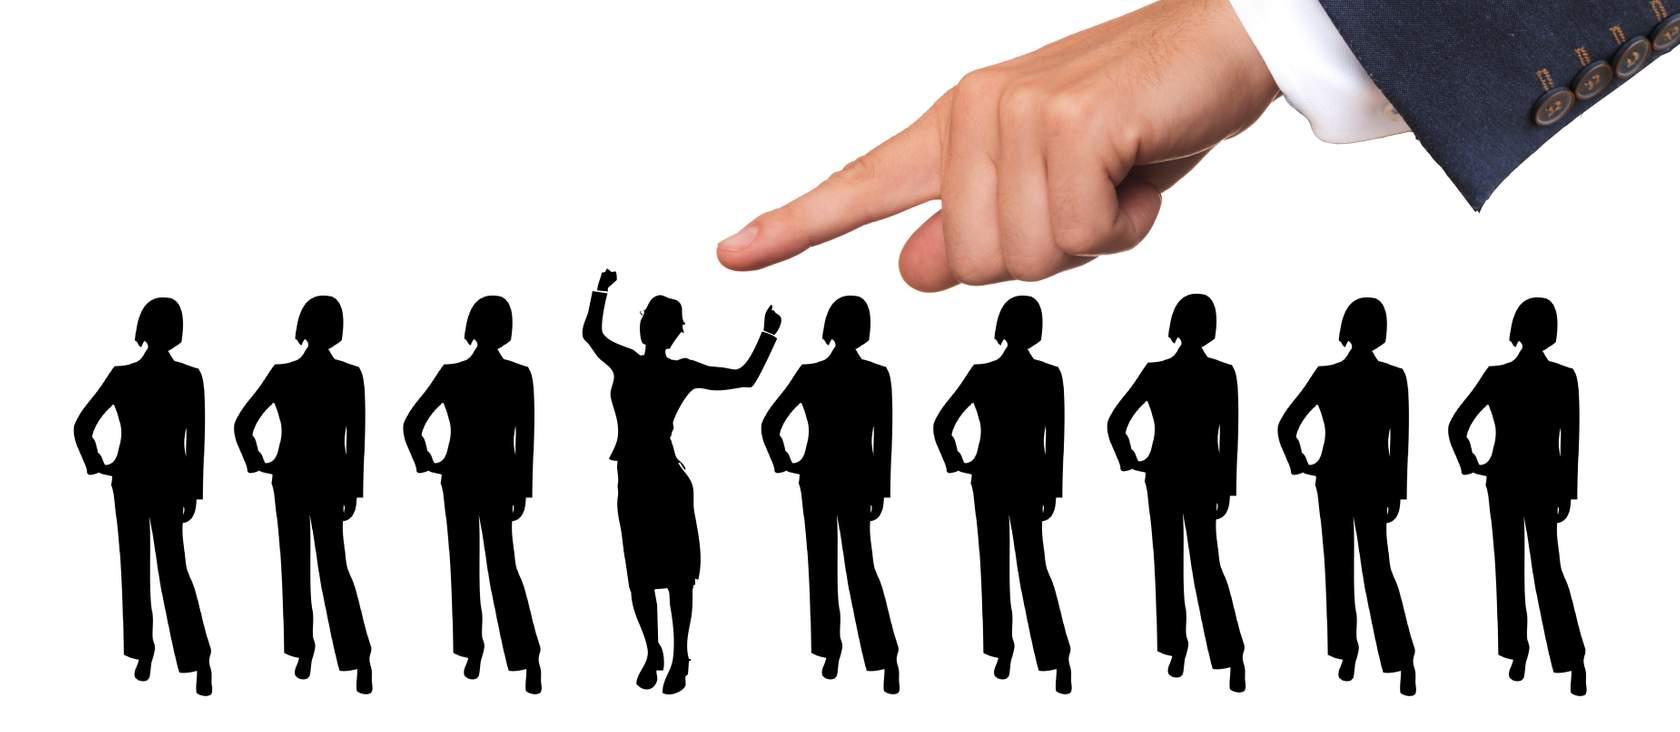 Sales Team Members are Company Brand Ambassadors